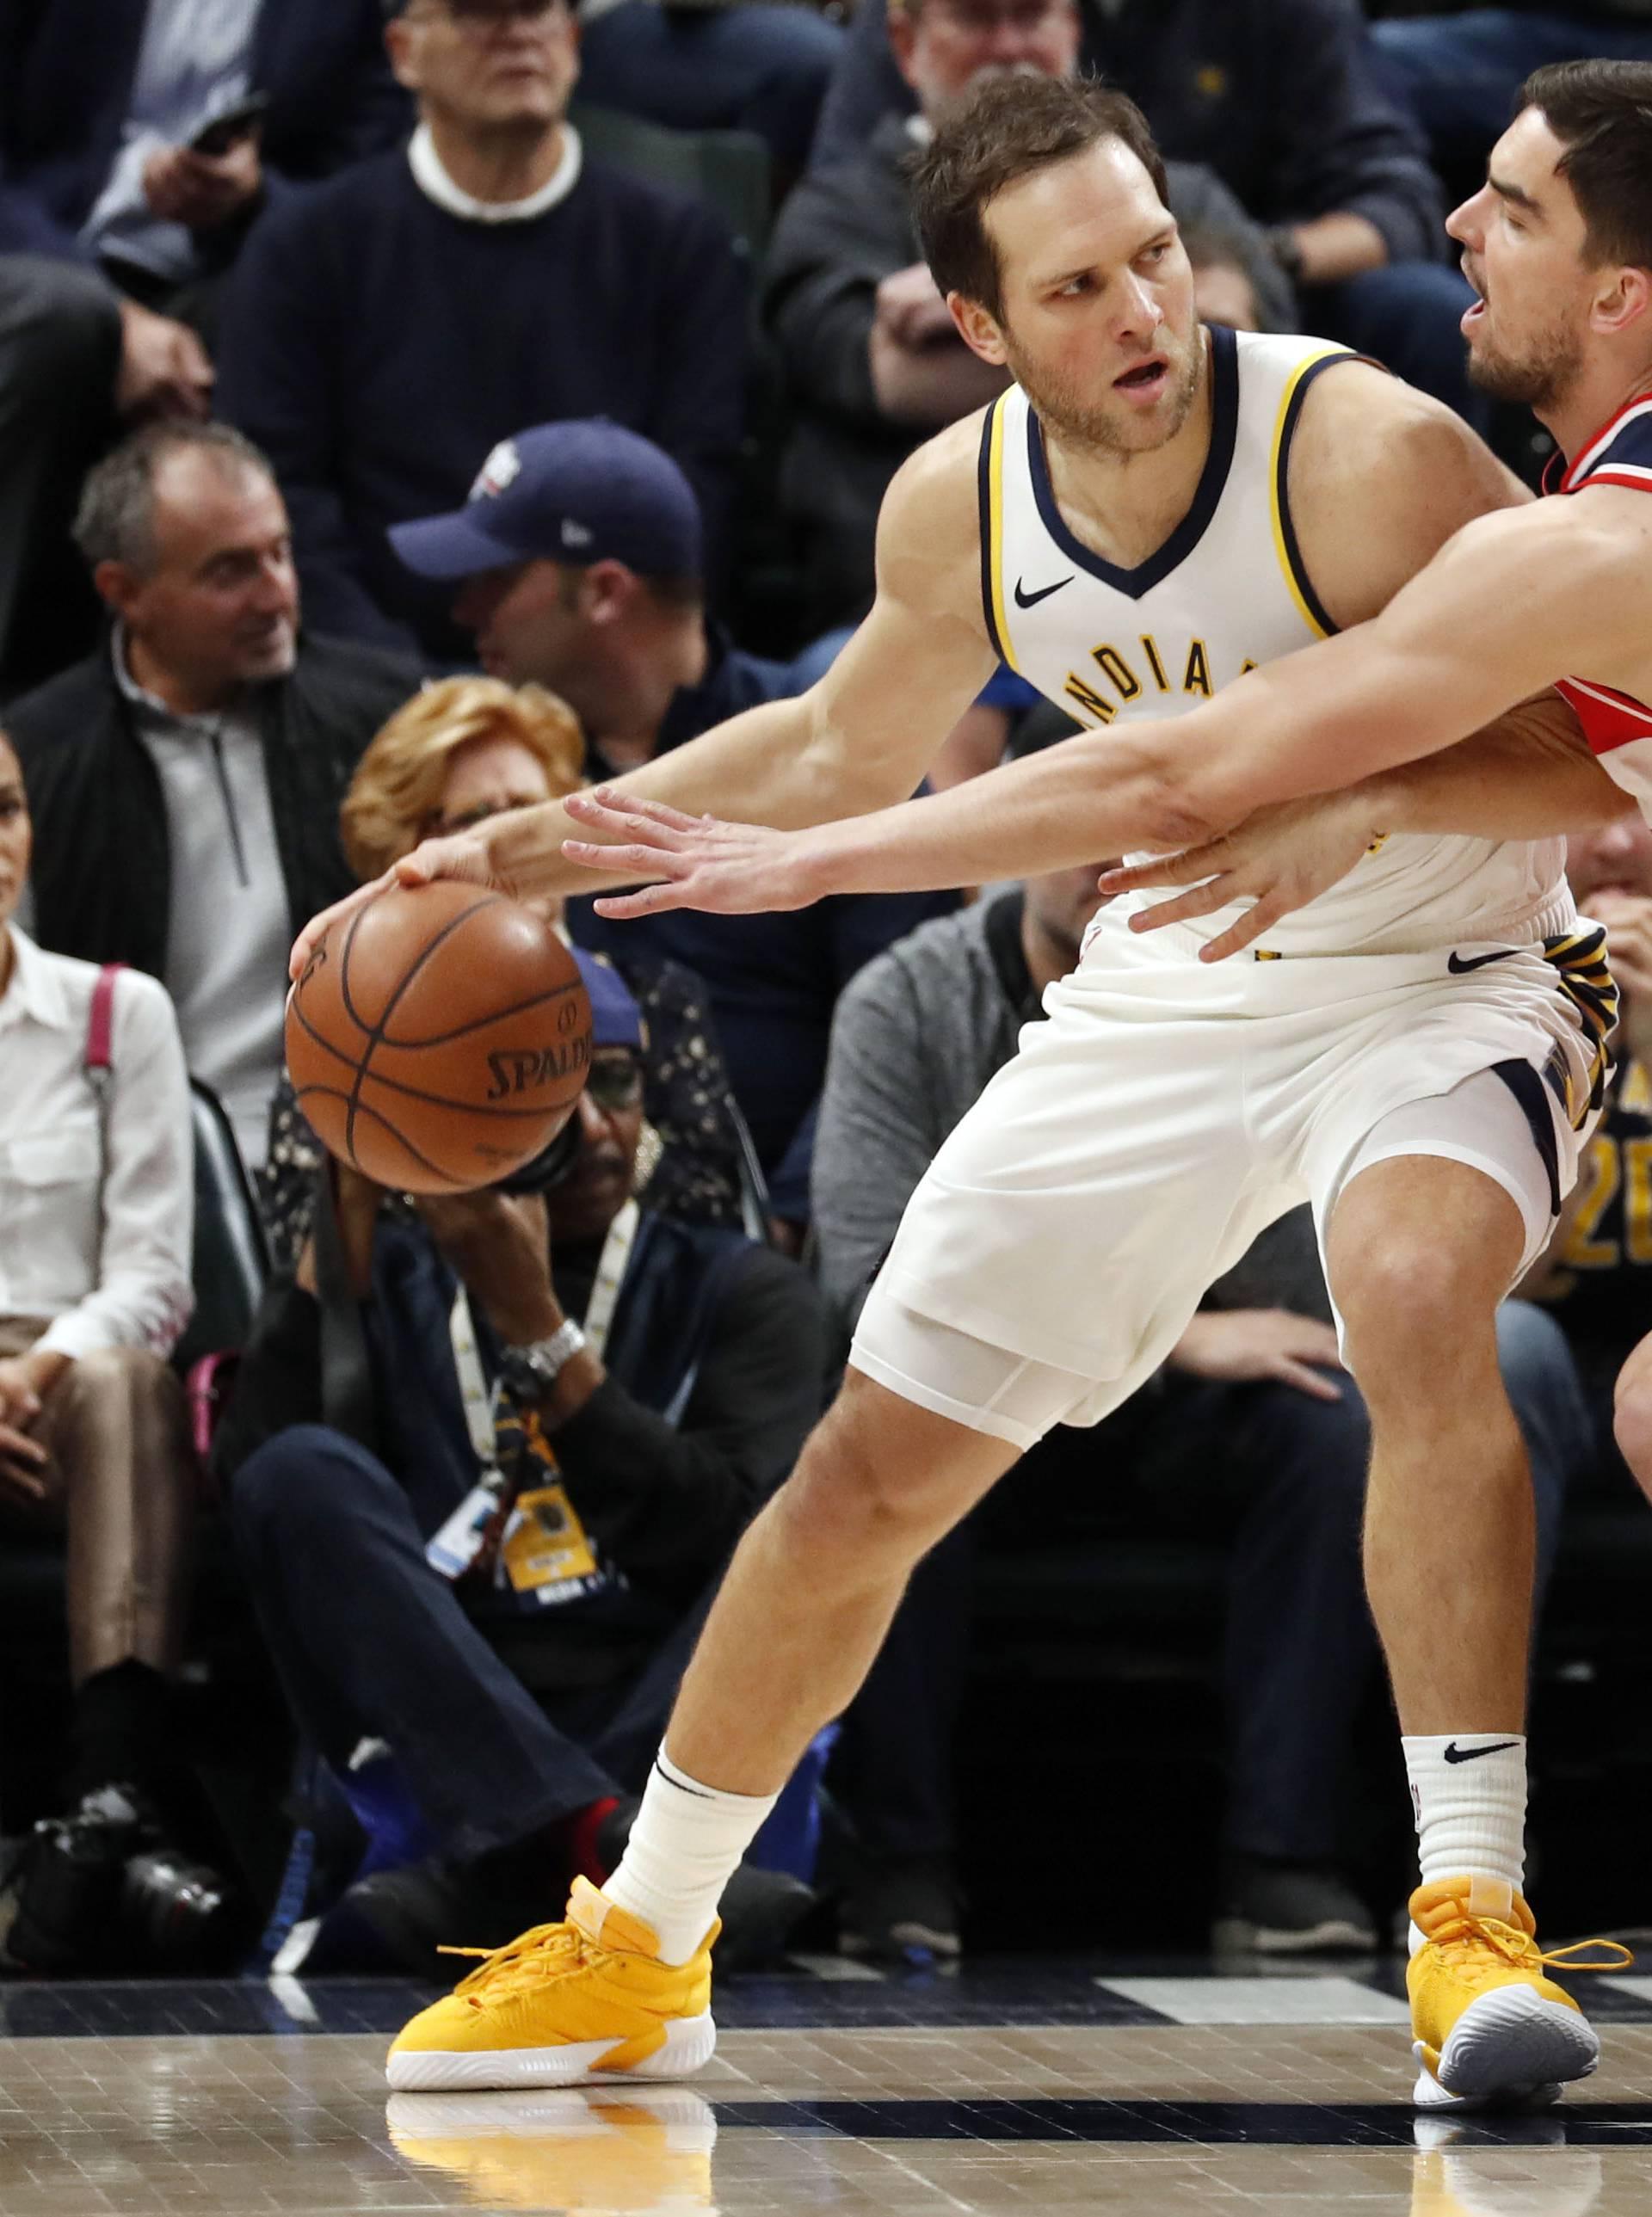 NBA: Washington Wizards at Indiana Pacers